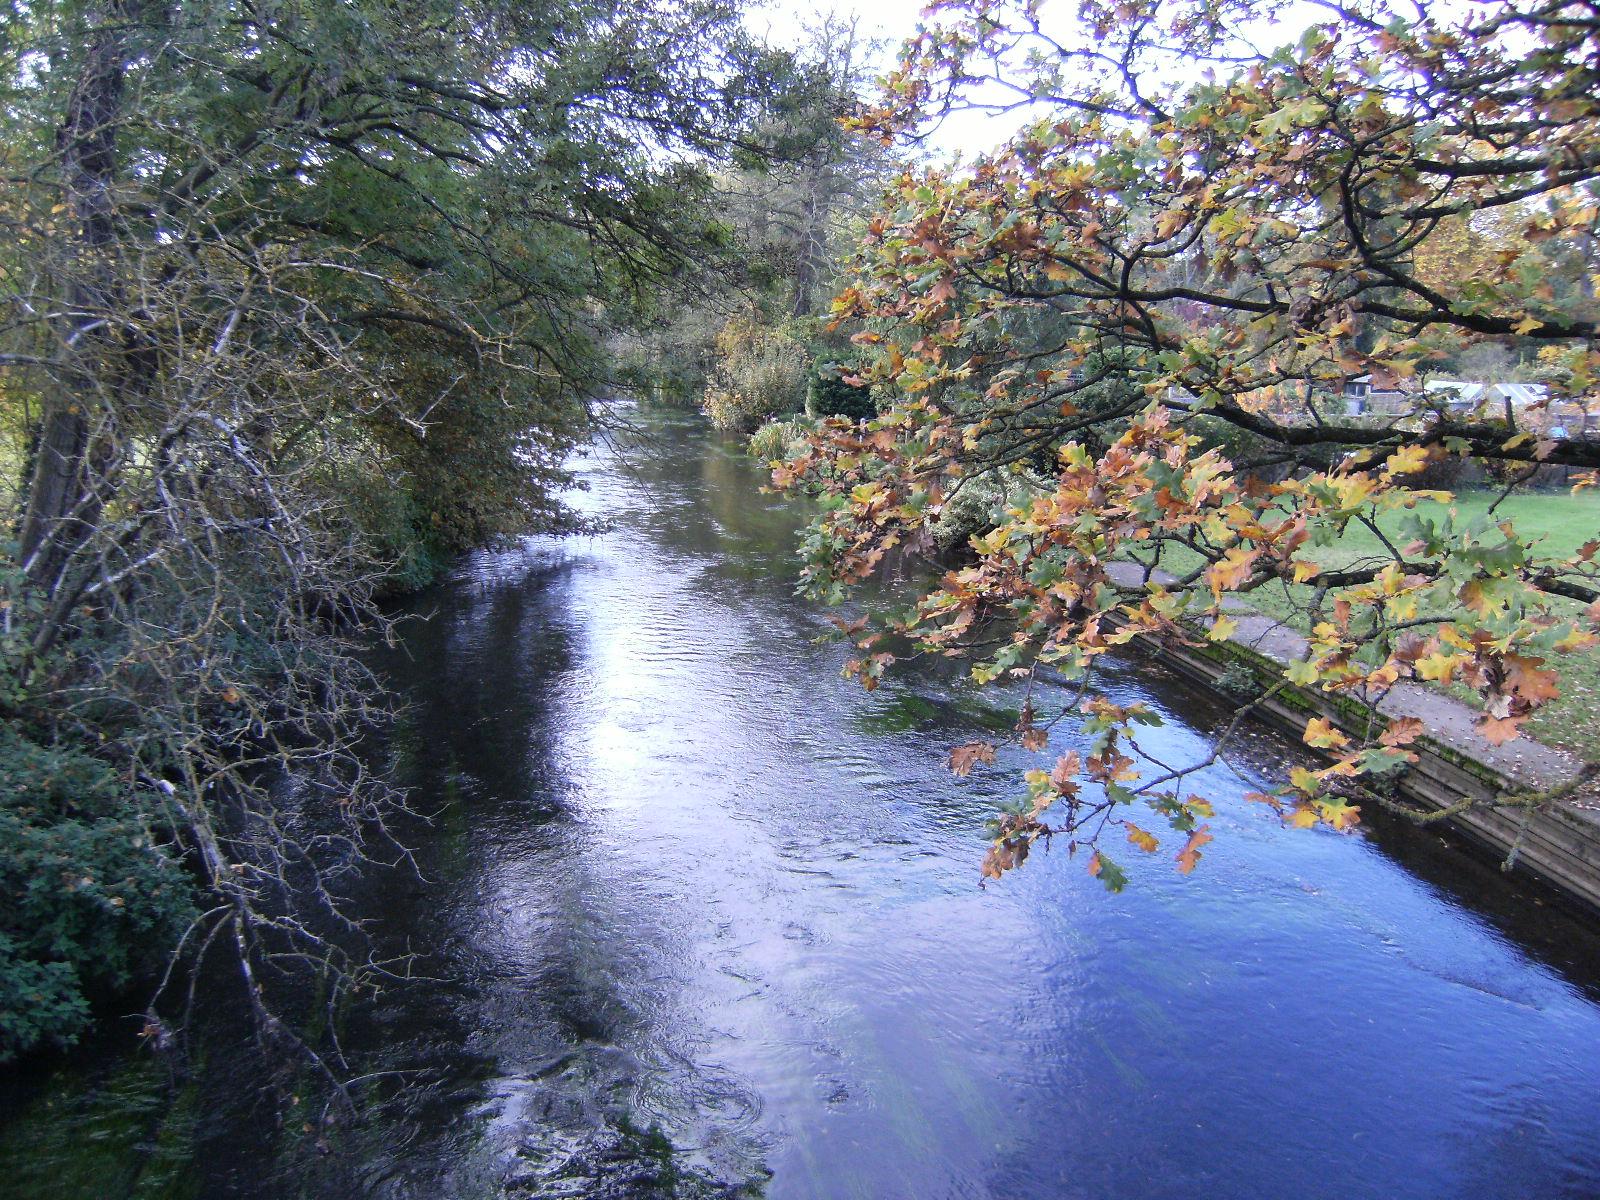 DSCF2293 Blackwater River at Eversley Bridge